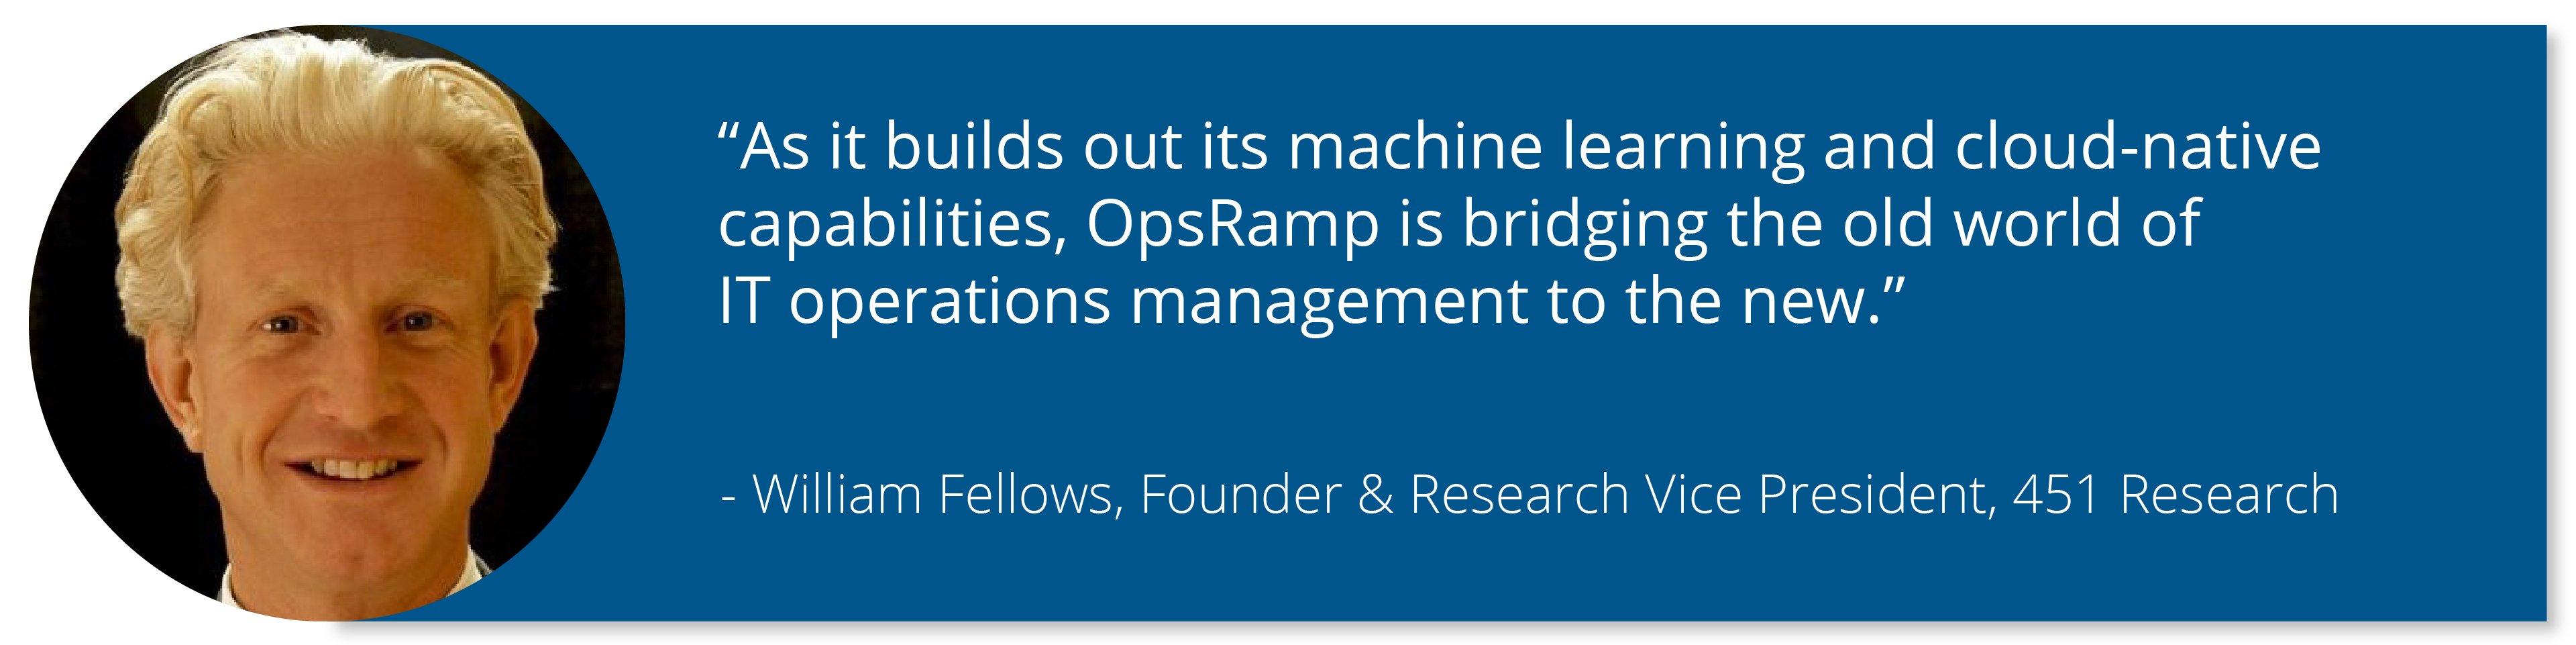 William Fellows-OpsRamp-Market-Impact-Report